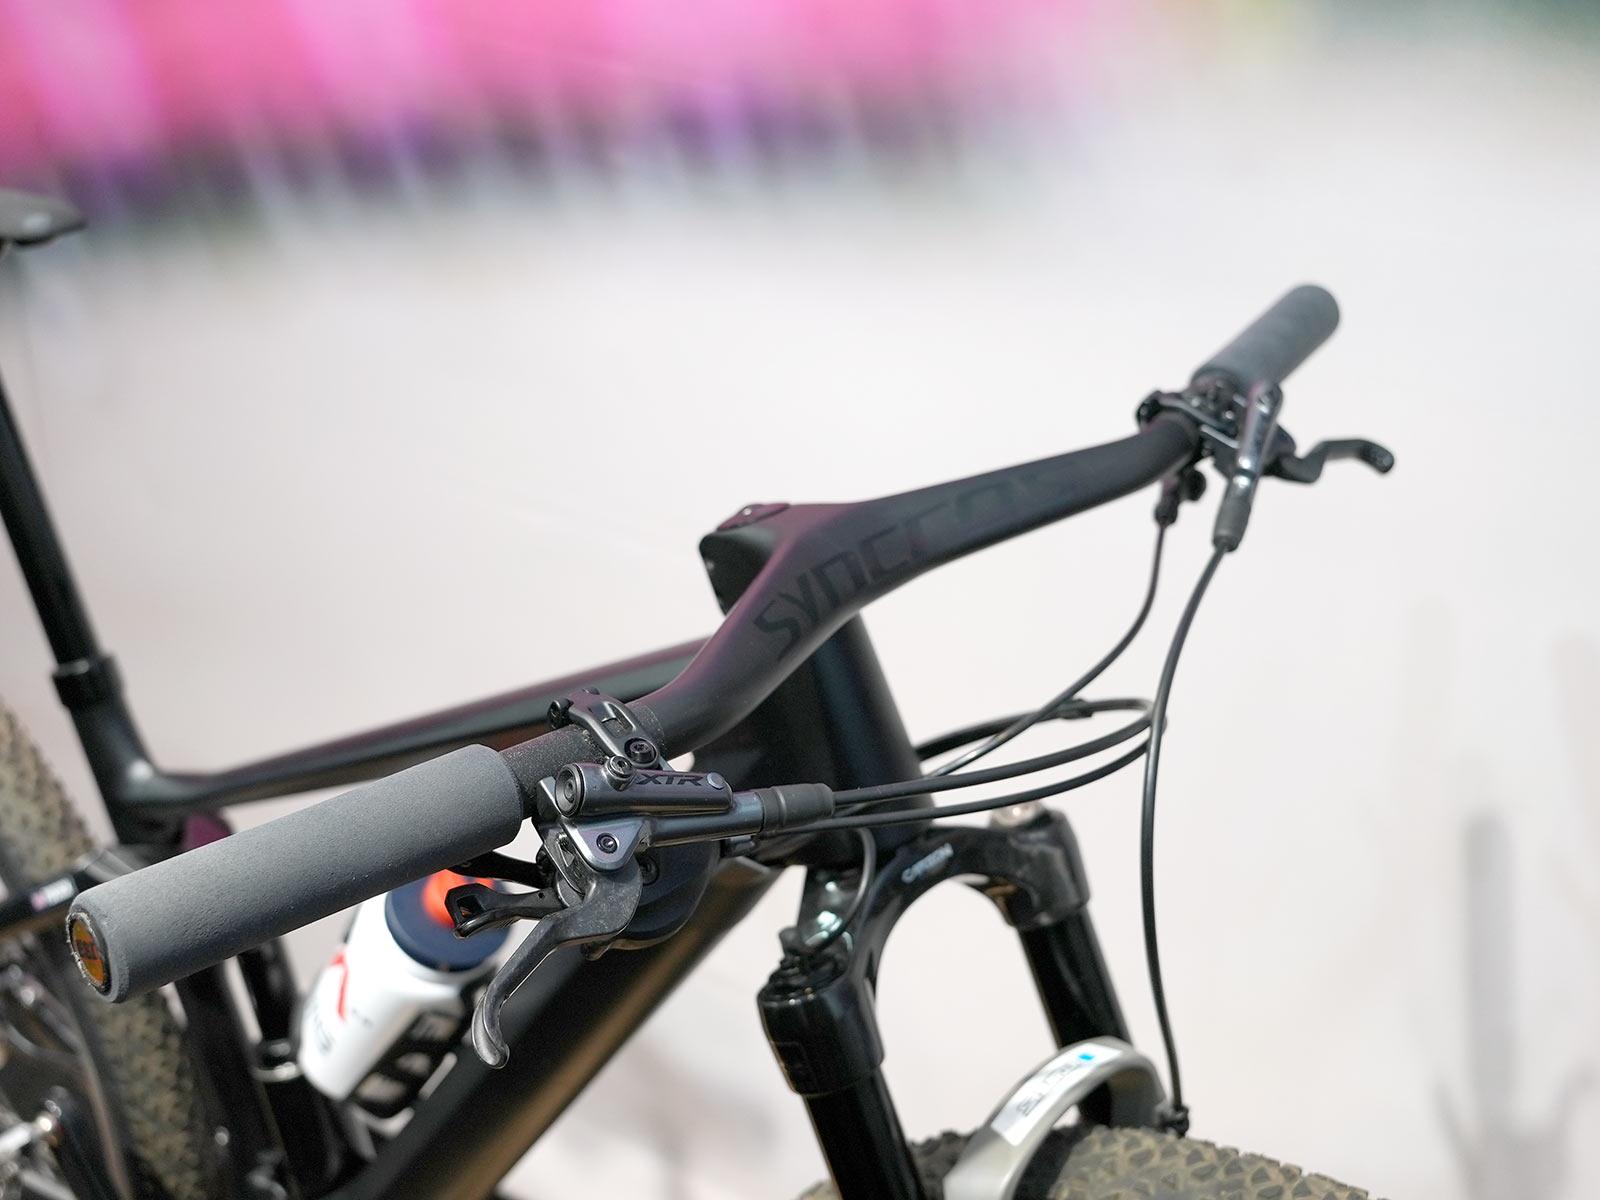 syncros cockpit and esi grips on tom pidcock's olympic mountain bike